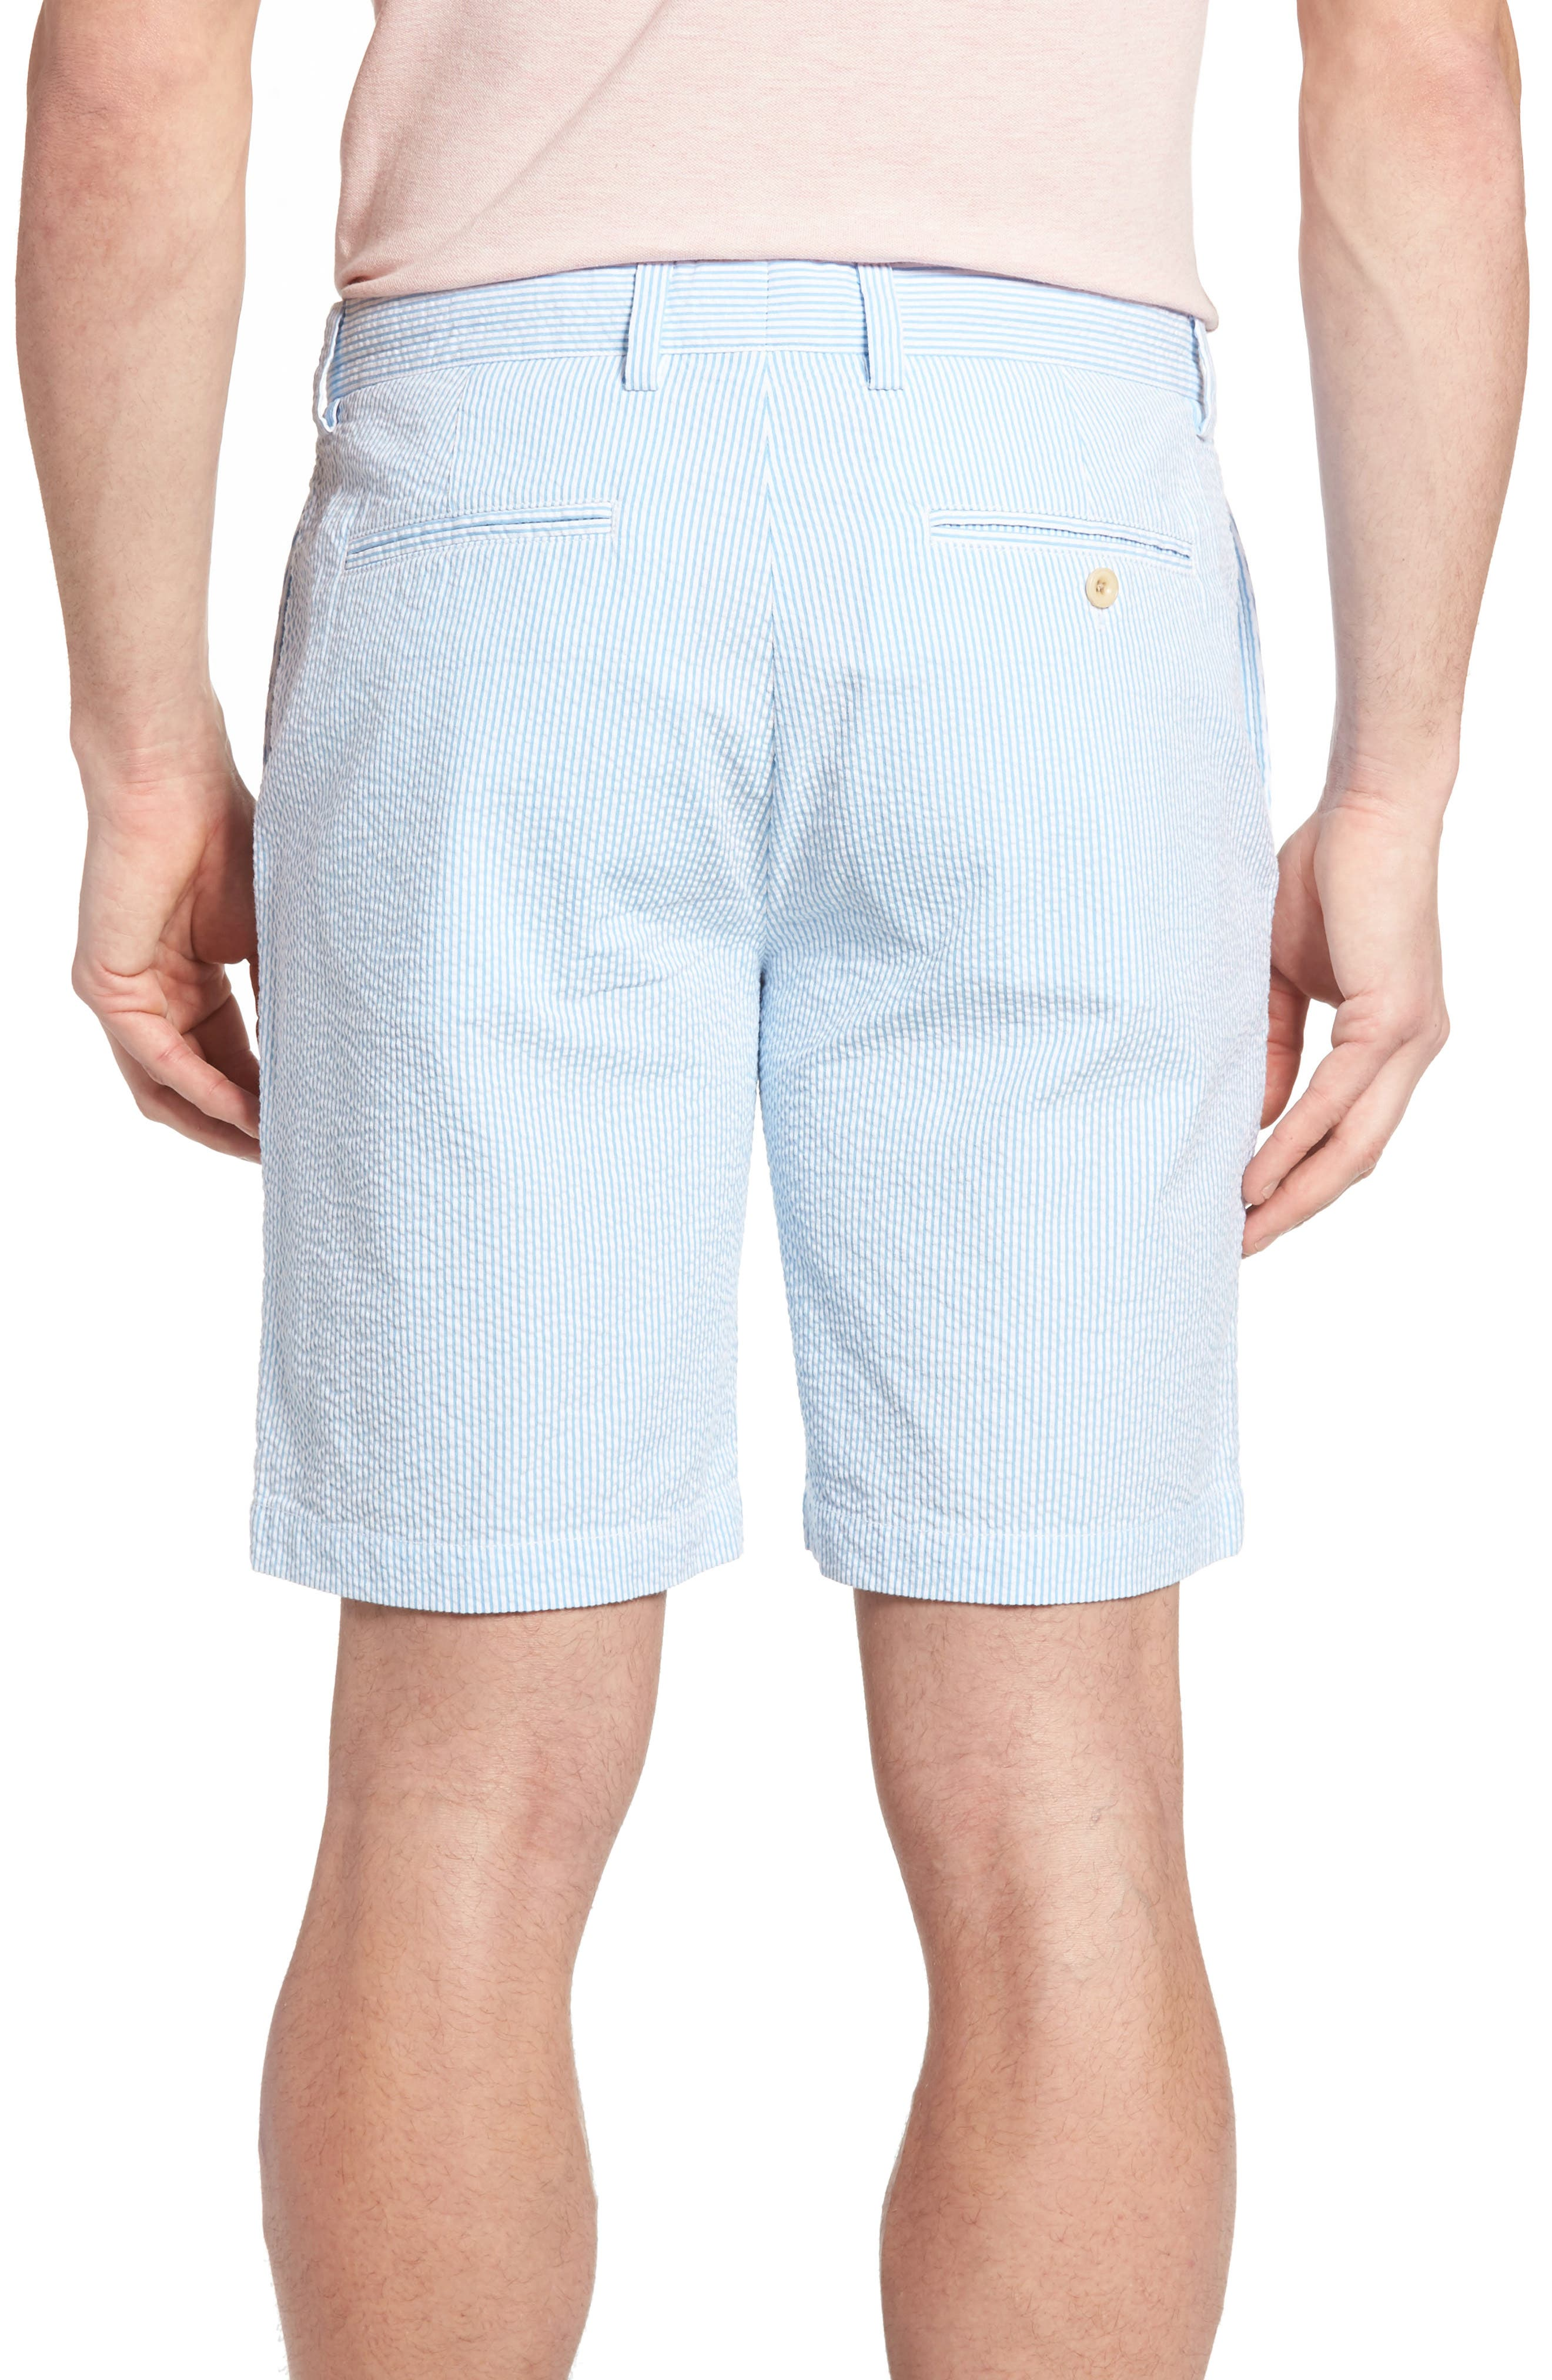 9 Inch Seersucker Shorts,                             Alternate thumbnail 3, color,